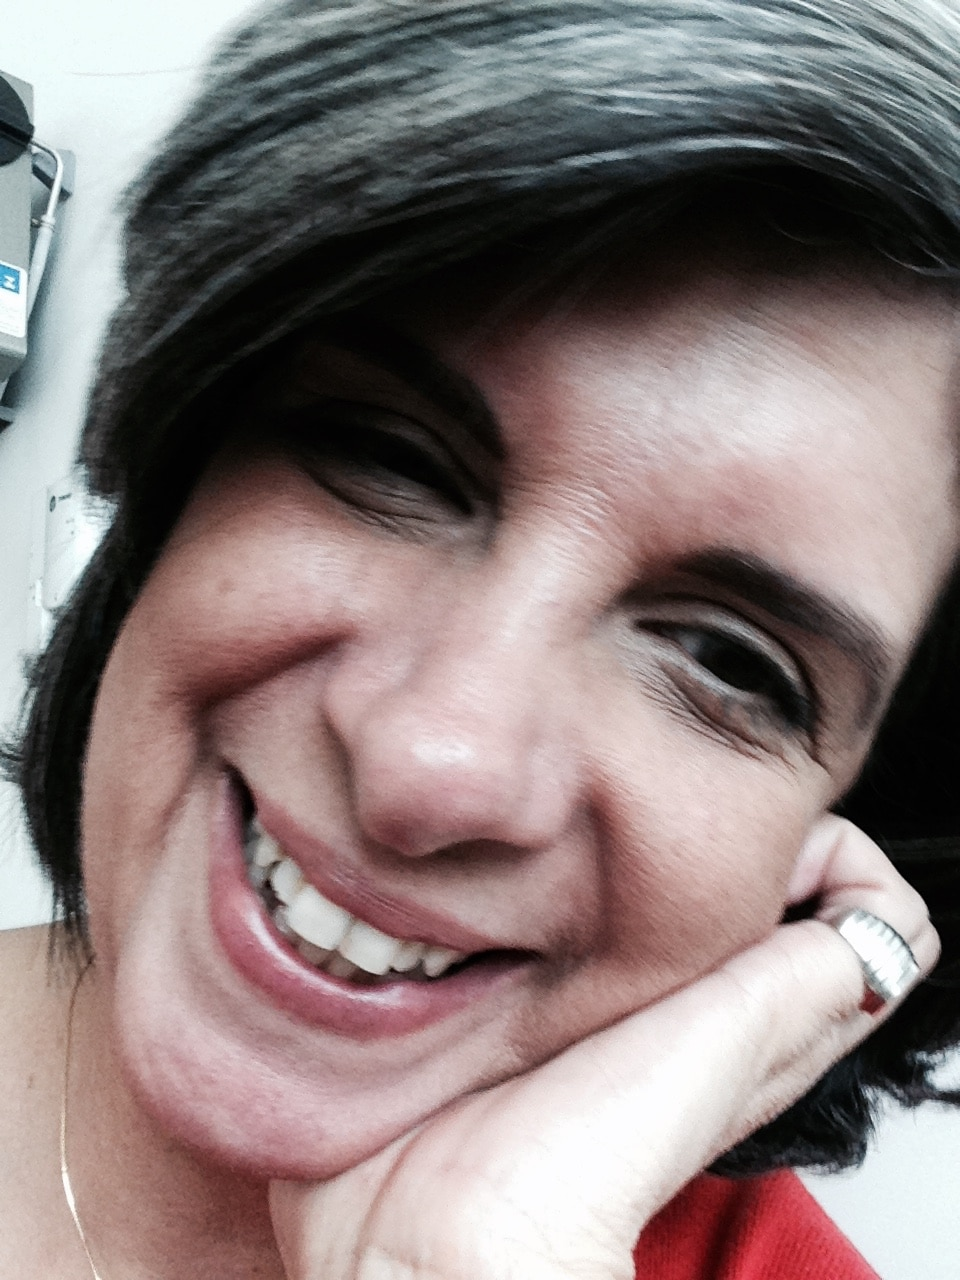 Sou a Celeste, moro no Rio de Janeiro, onde nasci